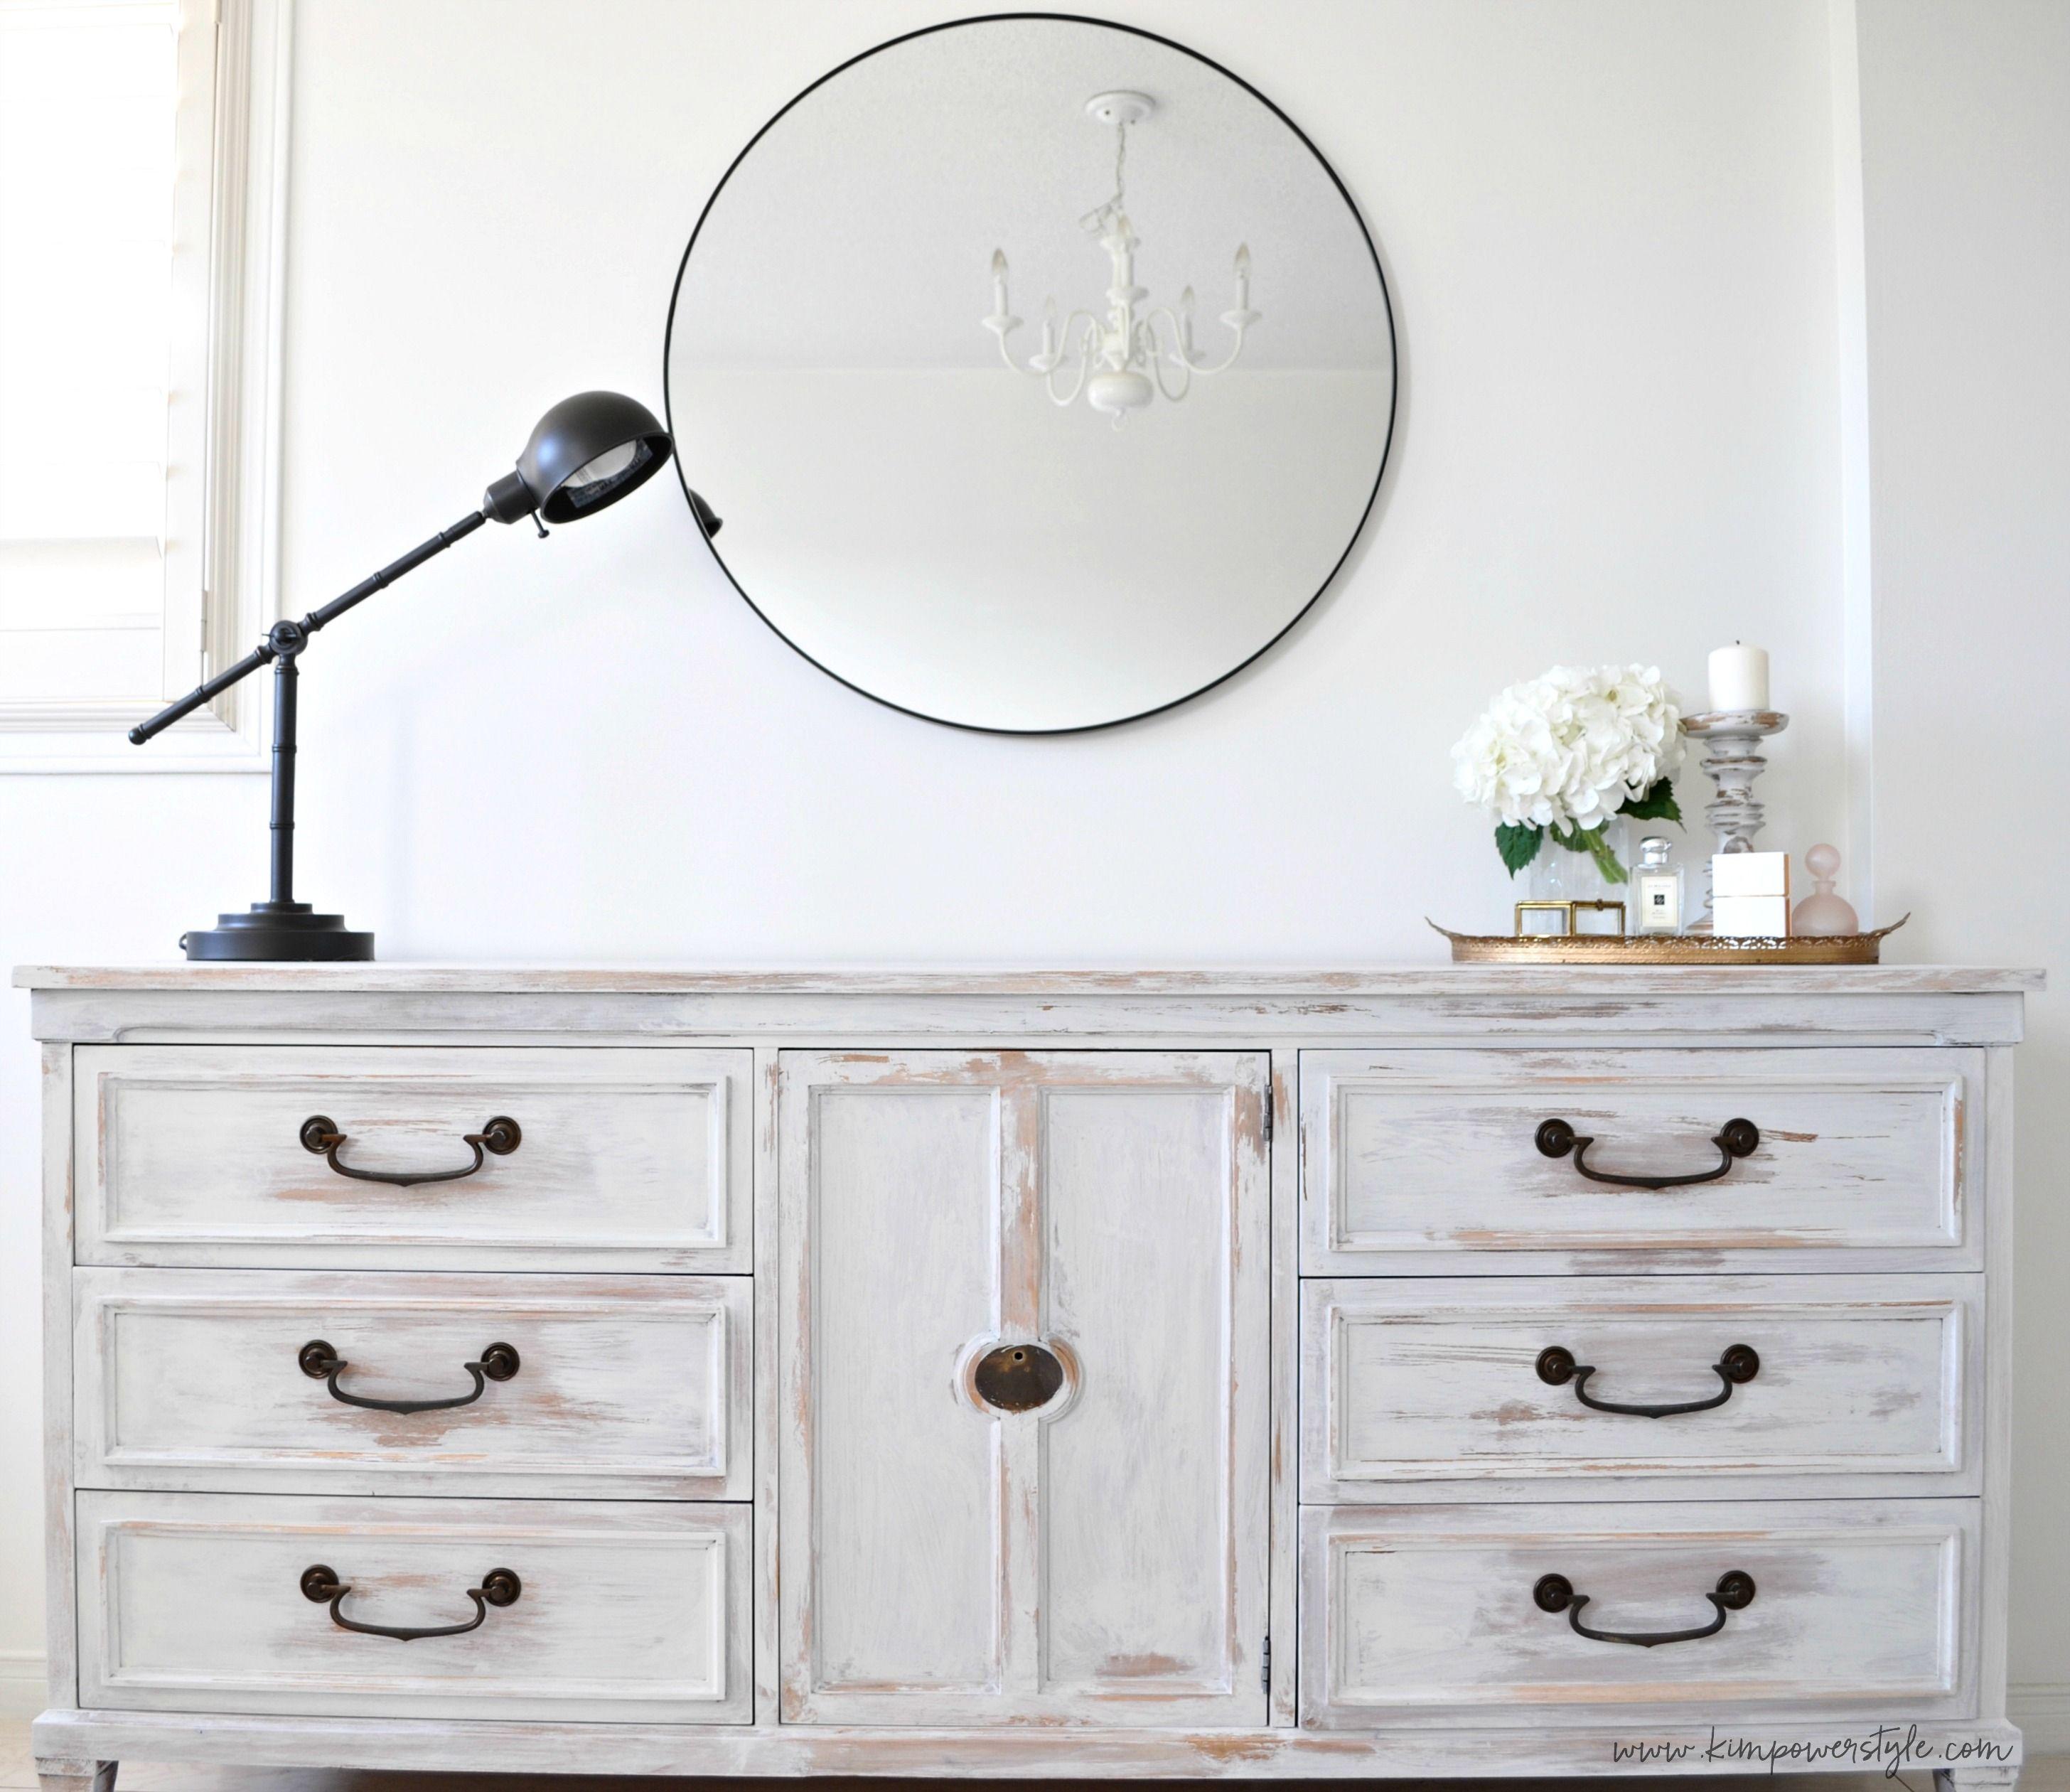 White Washing Furniture Tutorial On My Blog Furniture Makeover Ideas Wood White Washed Furniture Bedroom Furniture Makeover